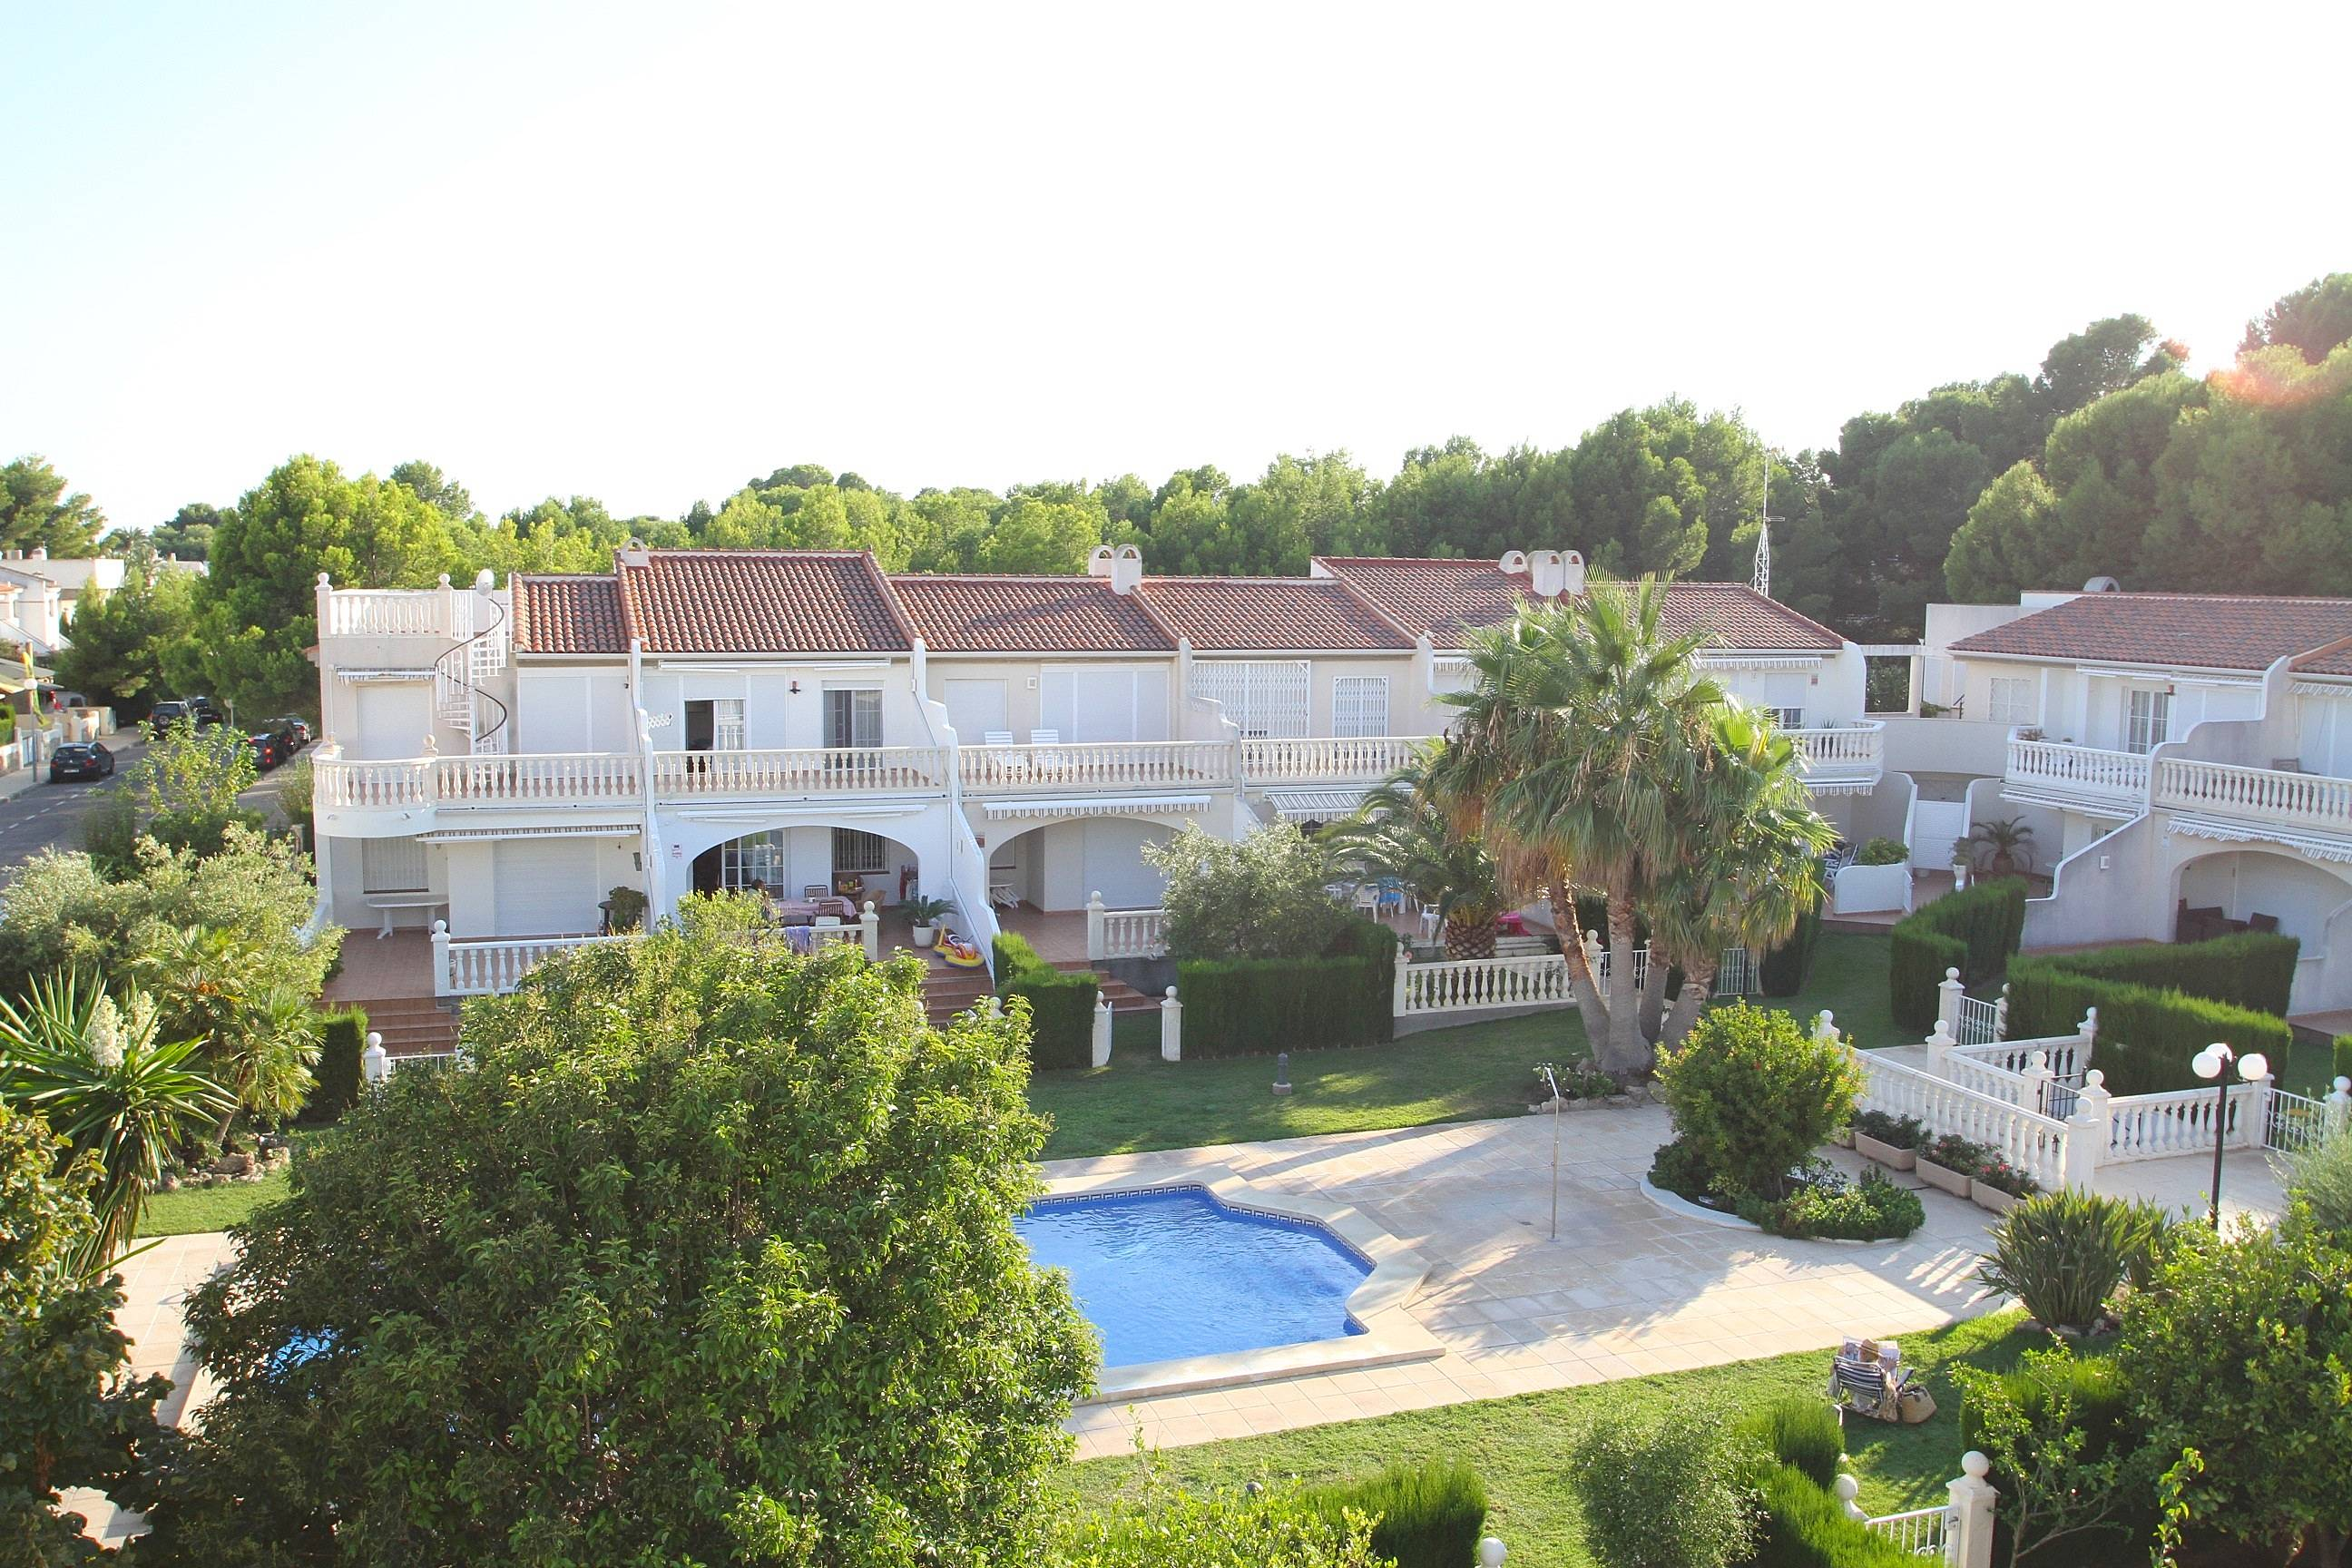 Casa en alquiler a 30 mts del mar playa cristal miami playa mont roig del camp tarragona - Casas alquiler costa dorada ...